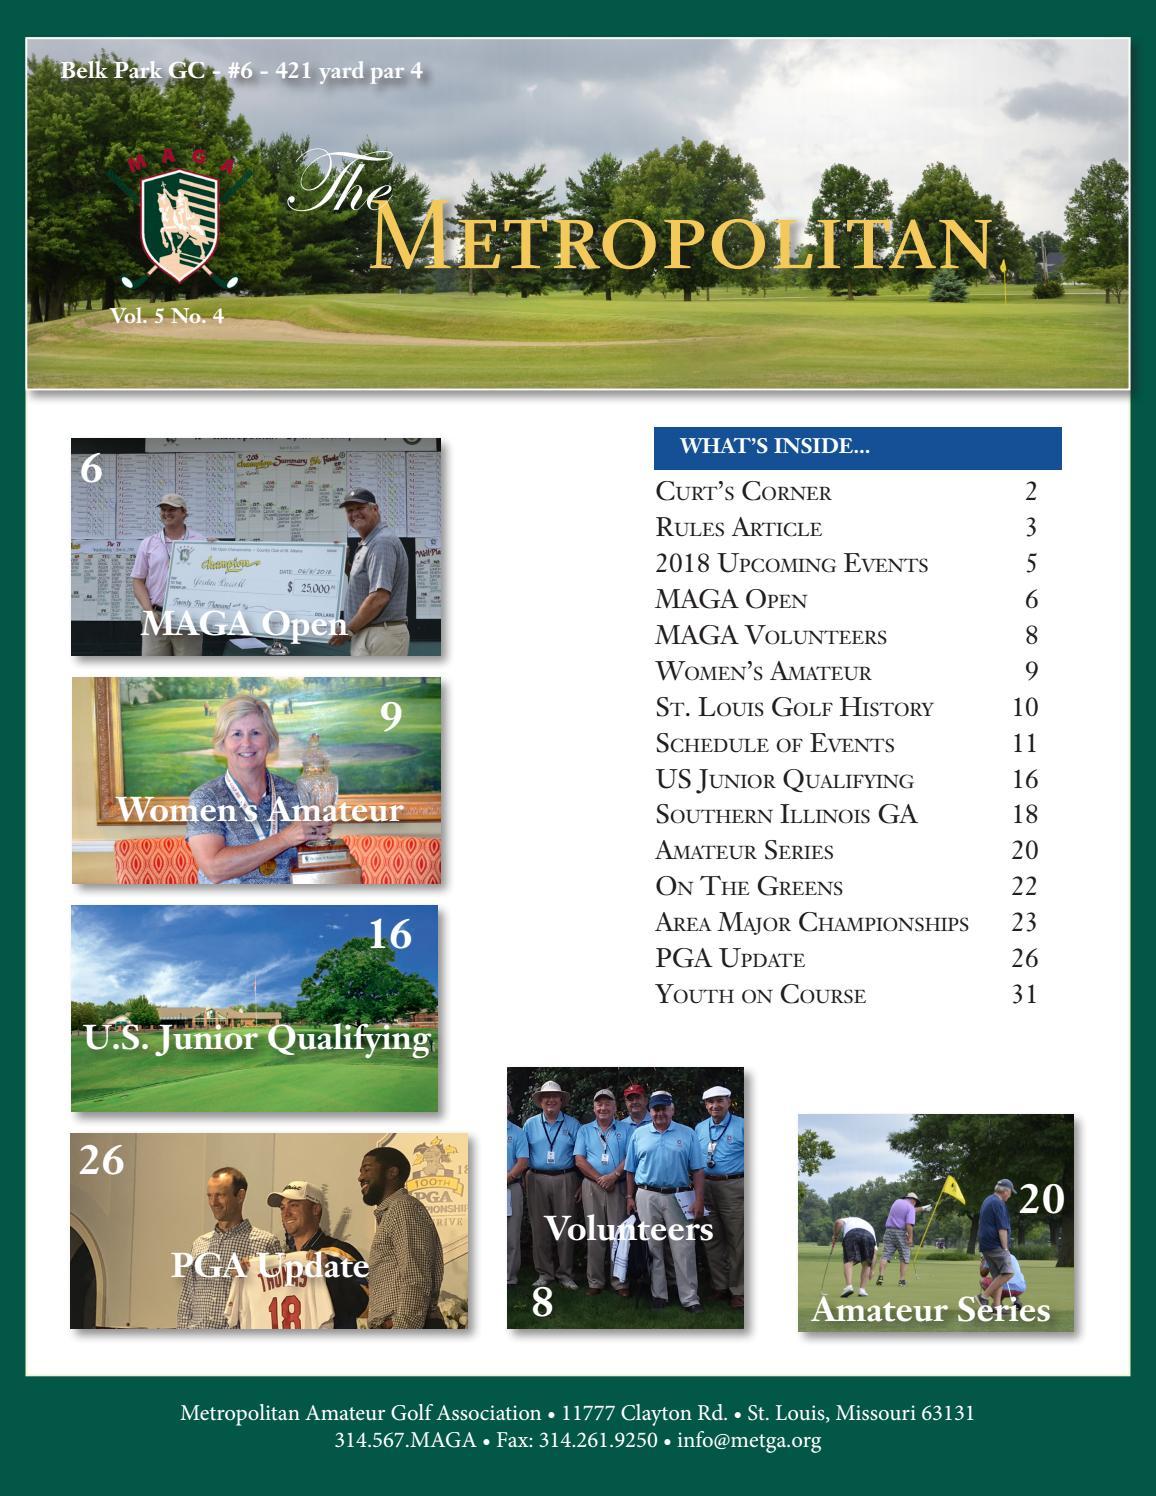 tampa bay city amateur golf turnier